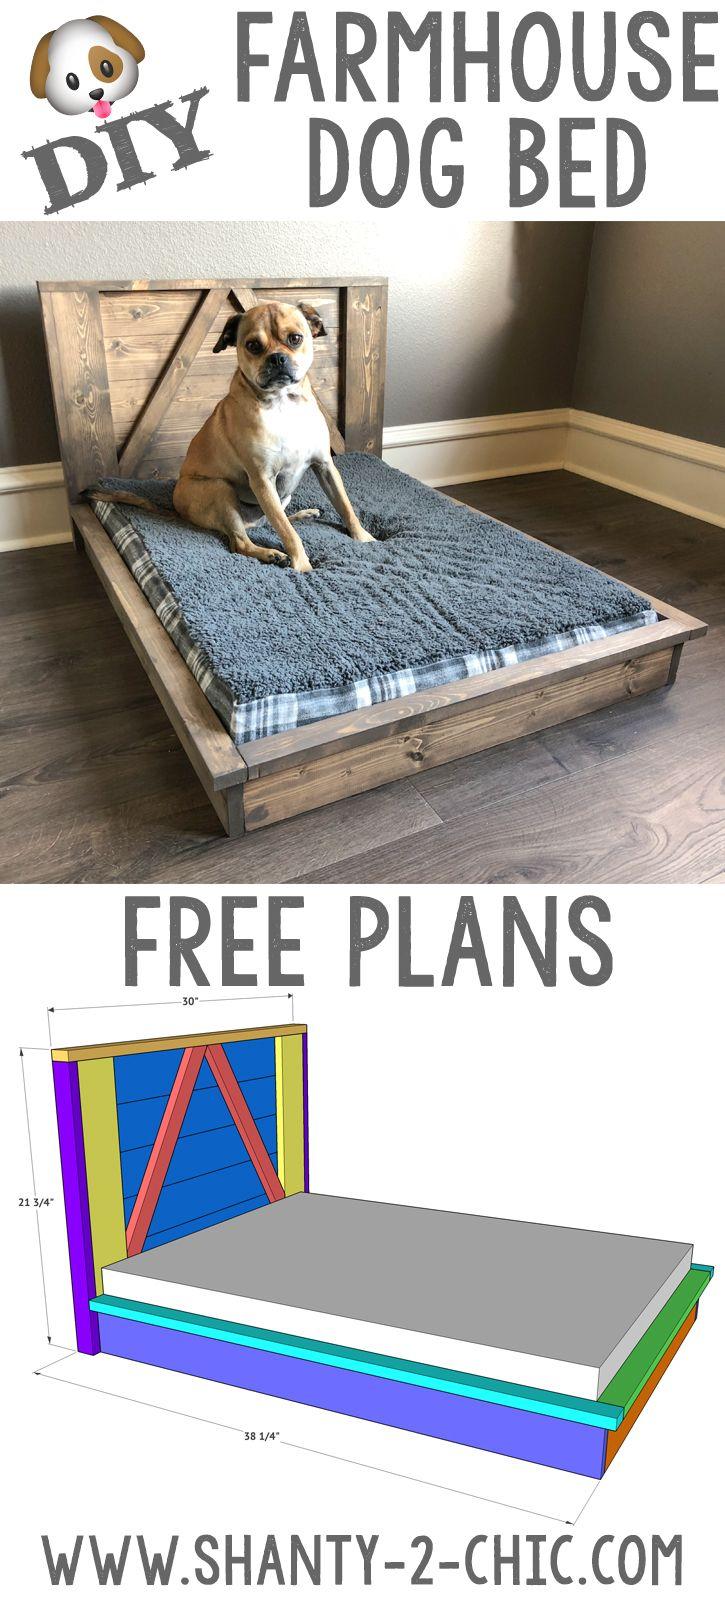 Diy Farmhouse Dog Bed Farmhouse Dog Beds Diy Dog Stuff Diy Dog Bed